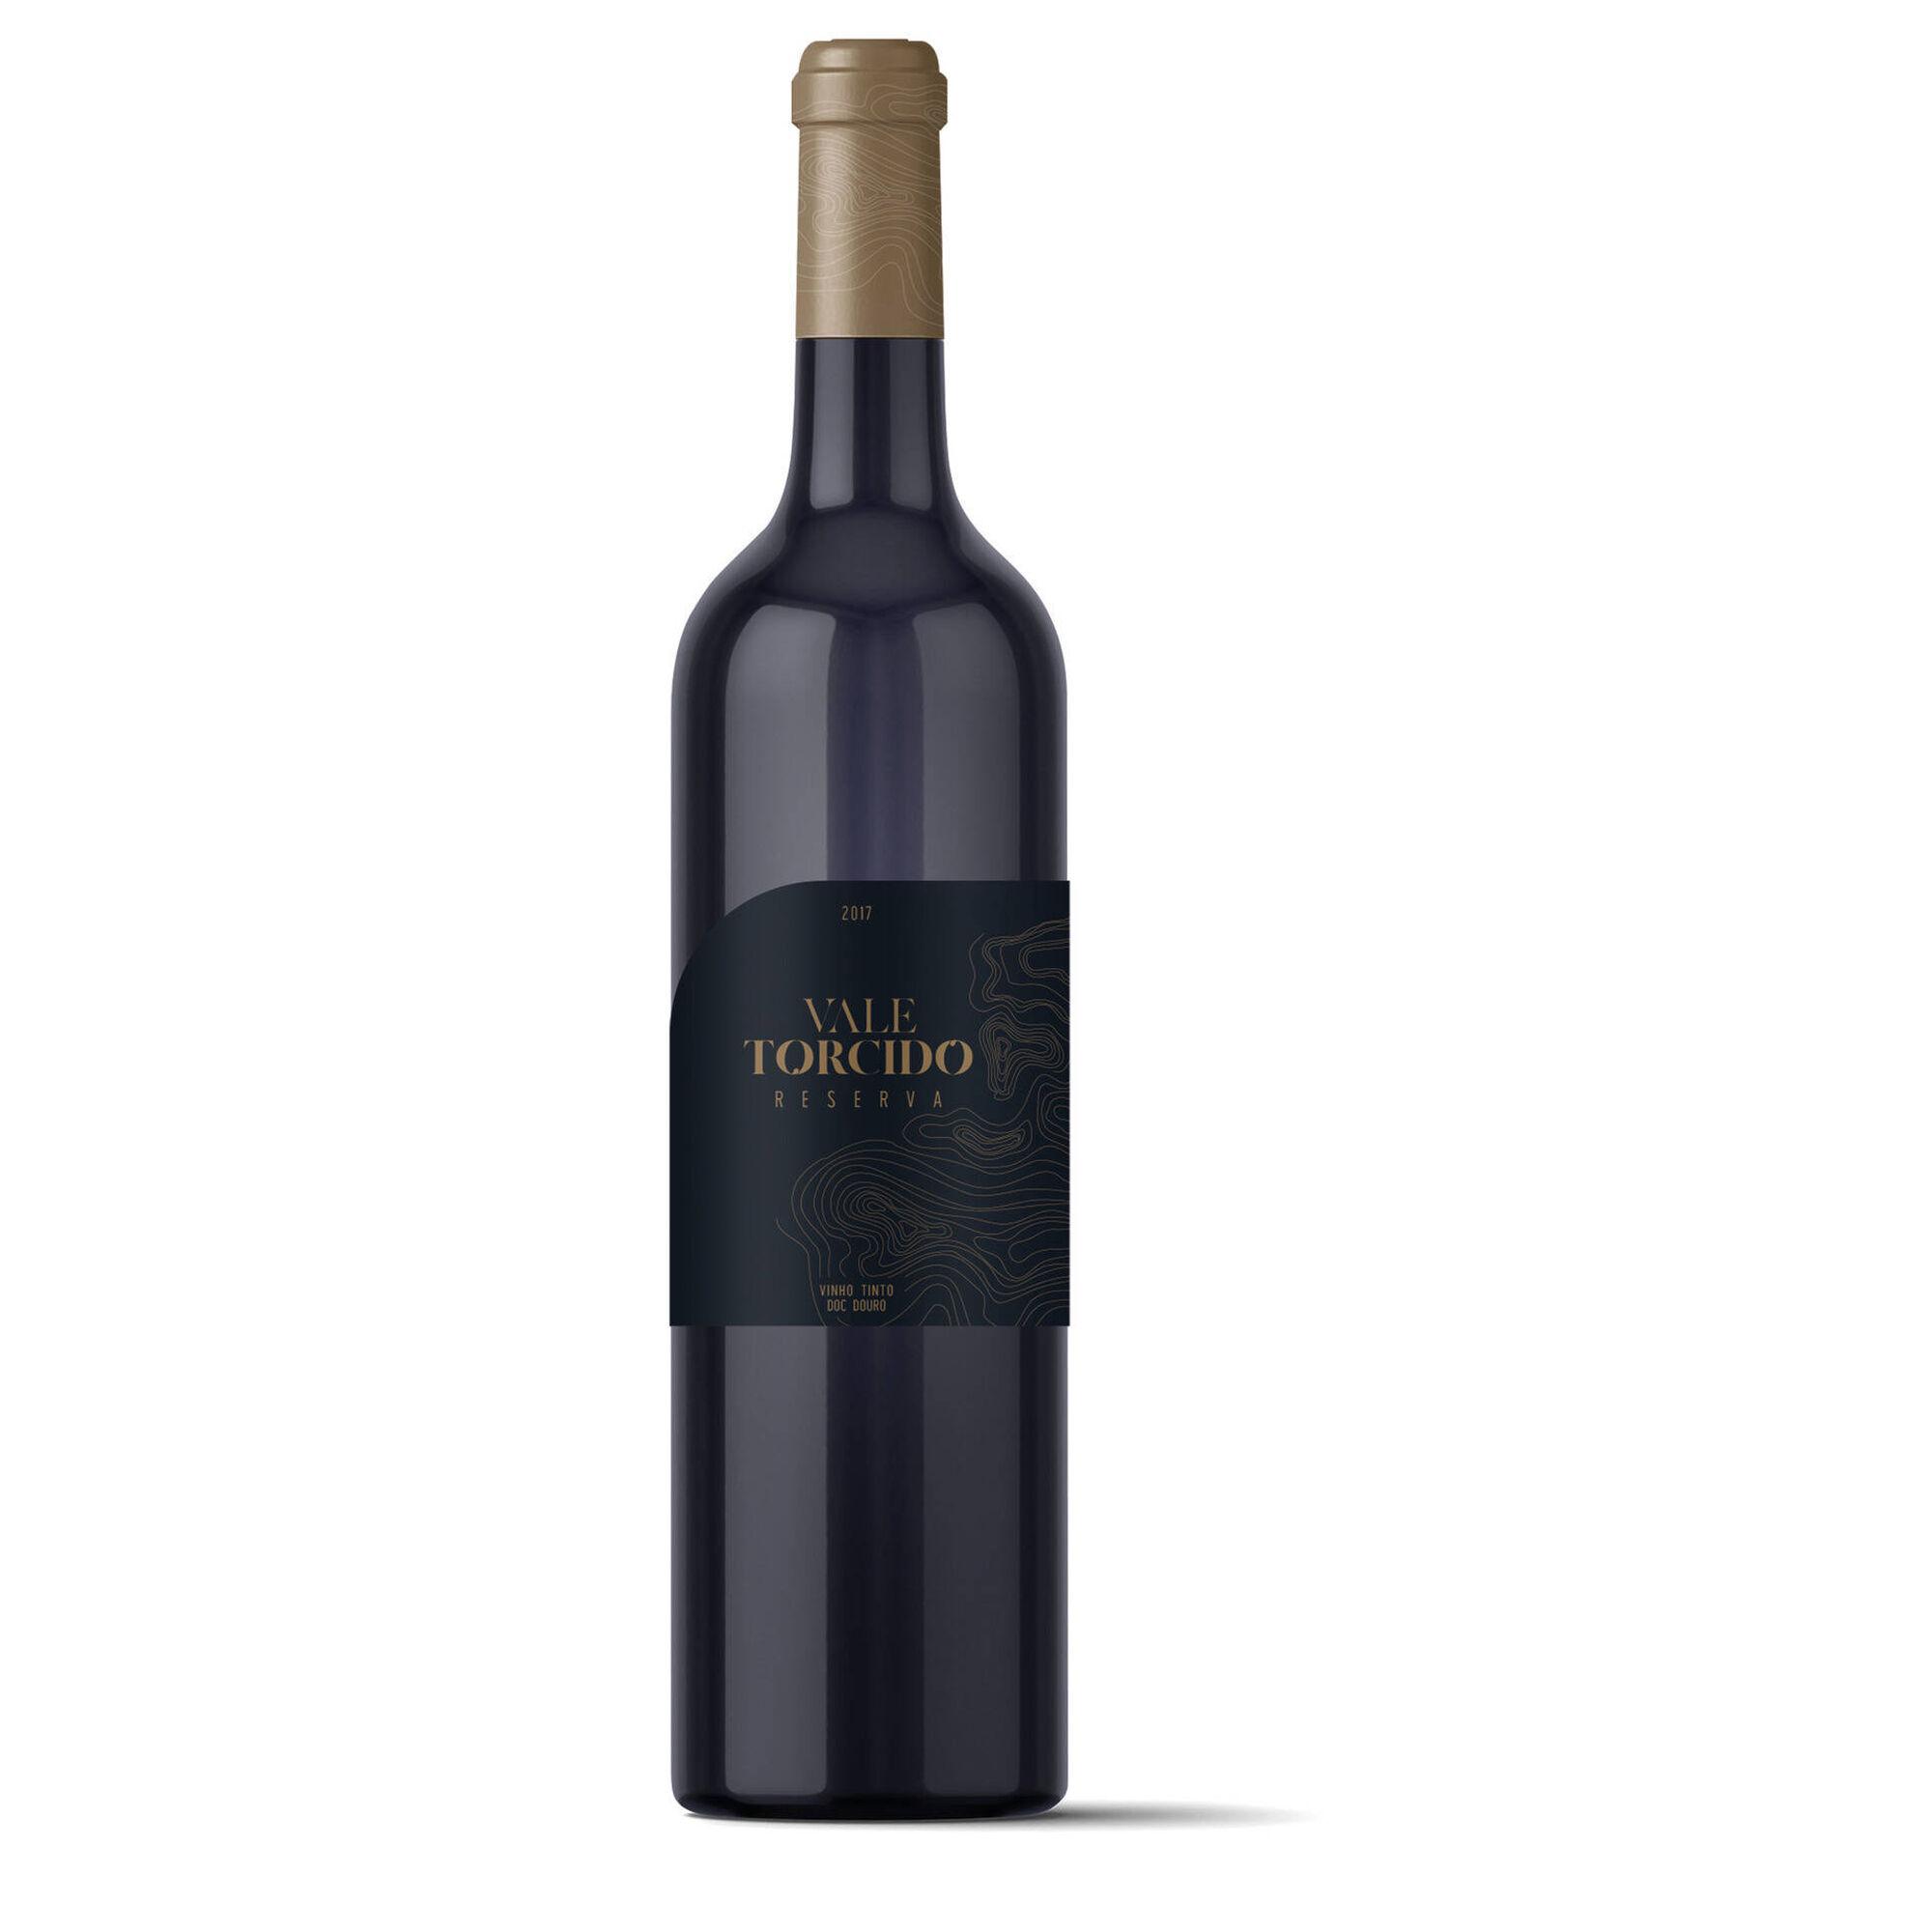 Vale Torcido Reserva DOC Douro Vinho Tinto